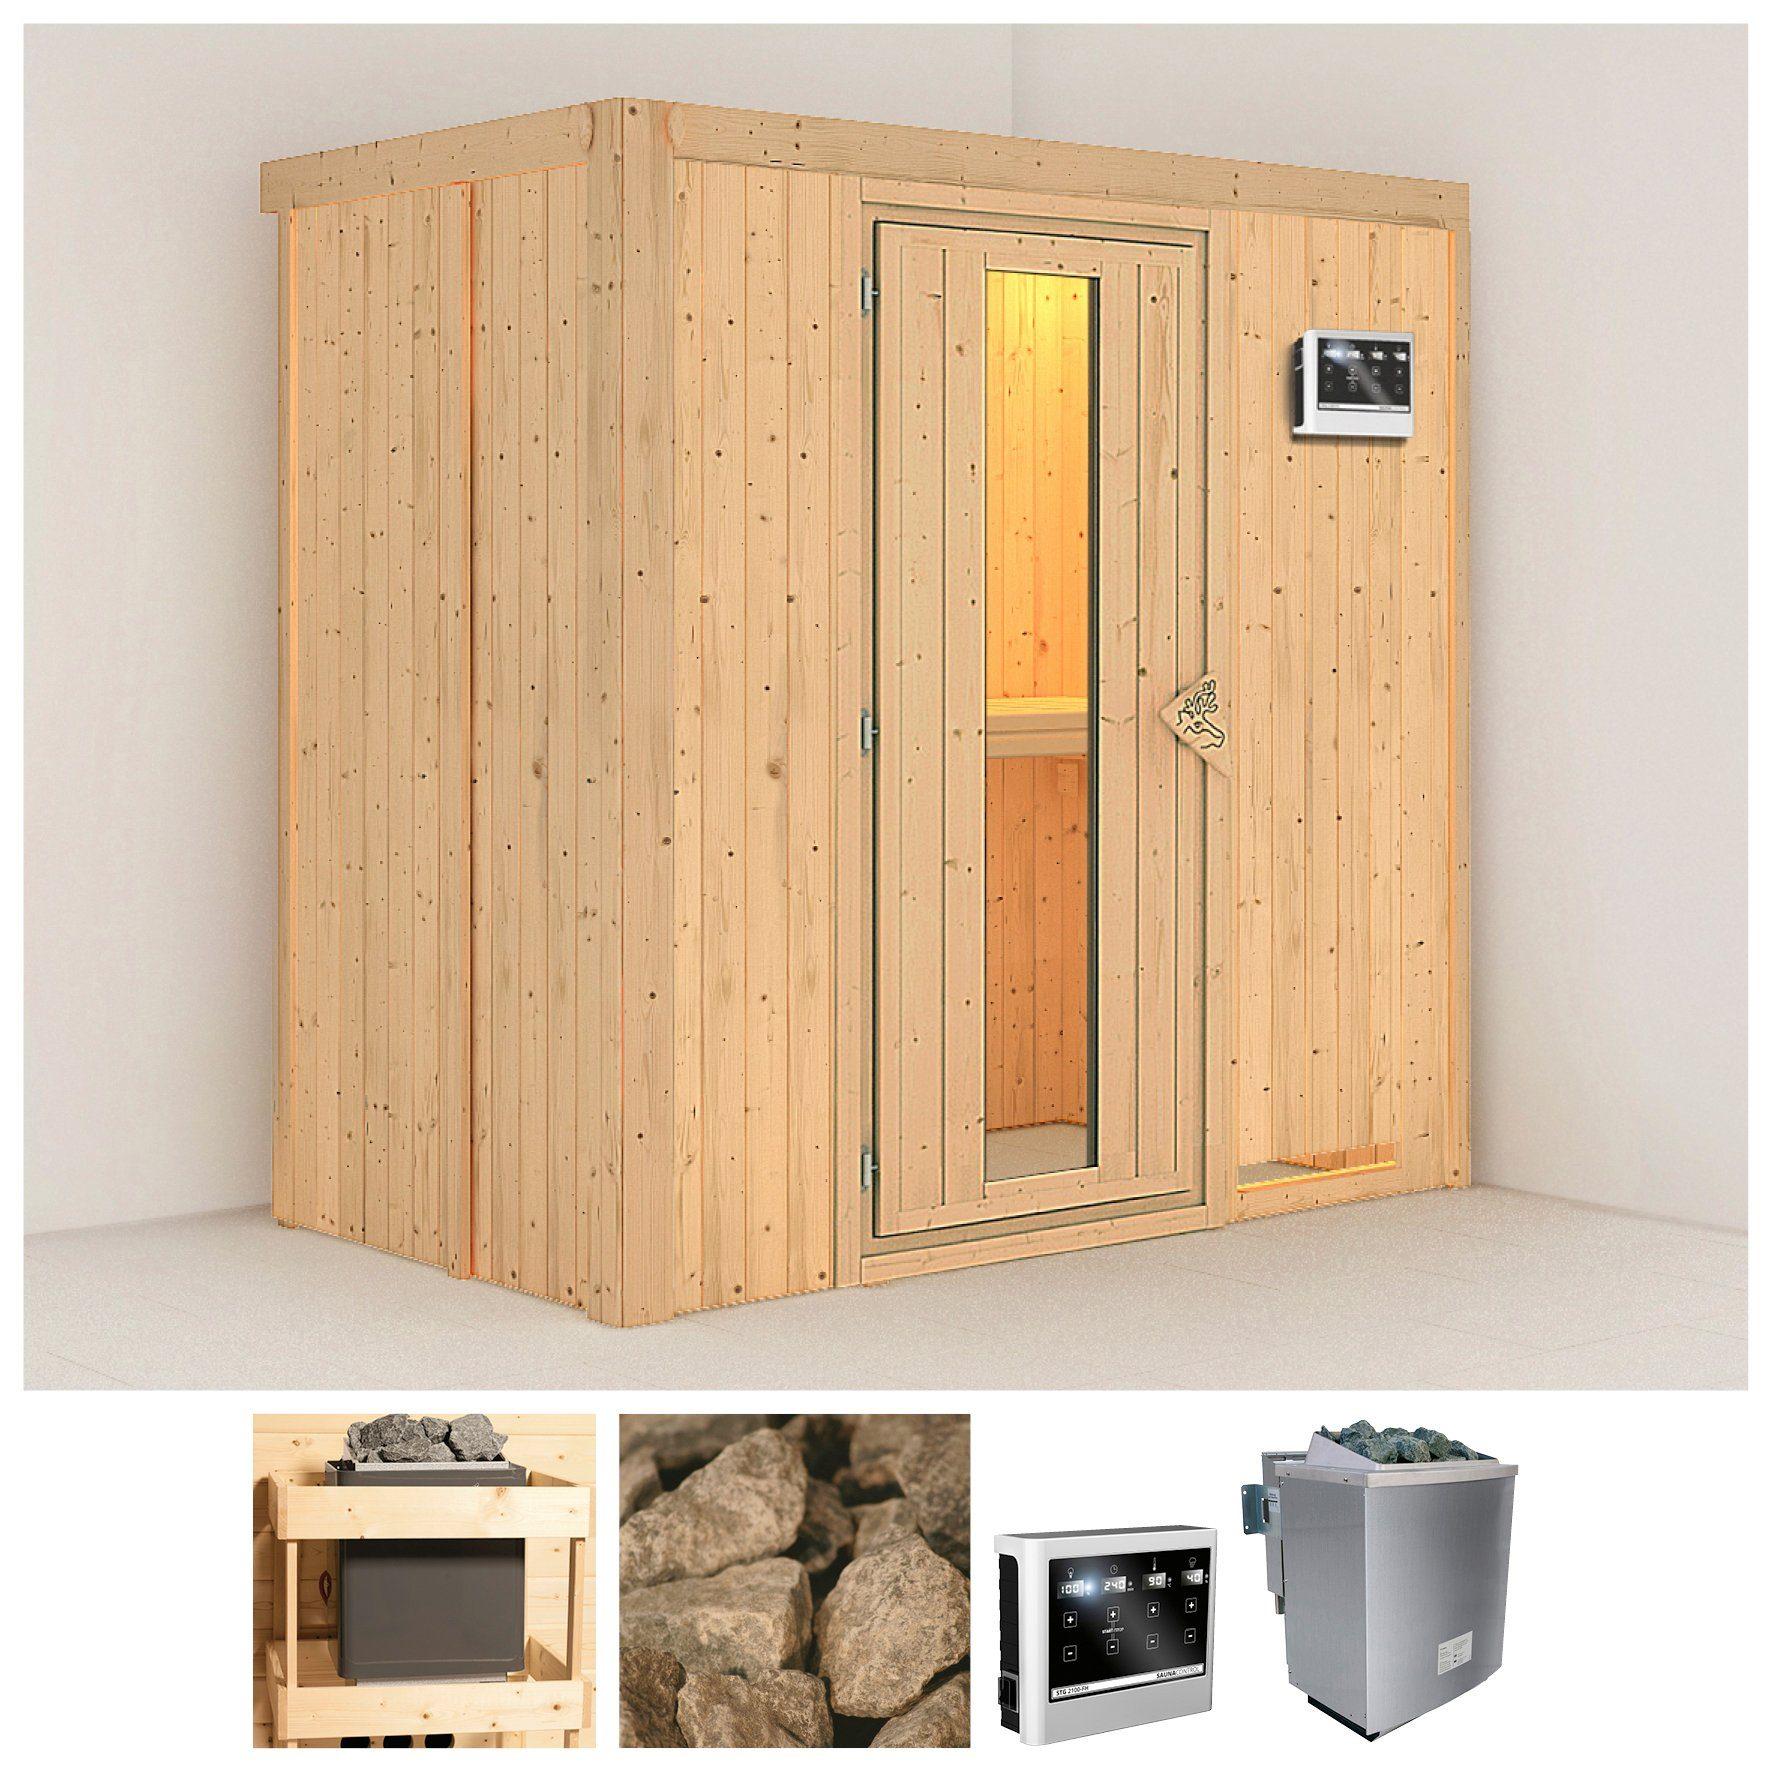 KONIFERA Sauna »Variado«, 196/118/198 cm, 9-kW-Bio-Ofen mit ext. Strg., Holztür